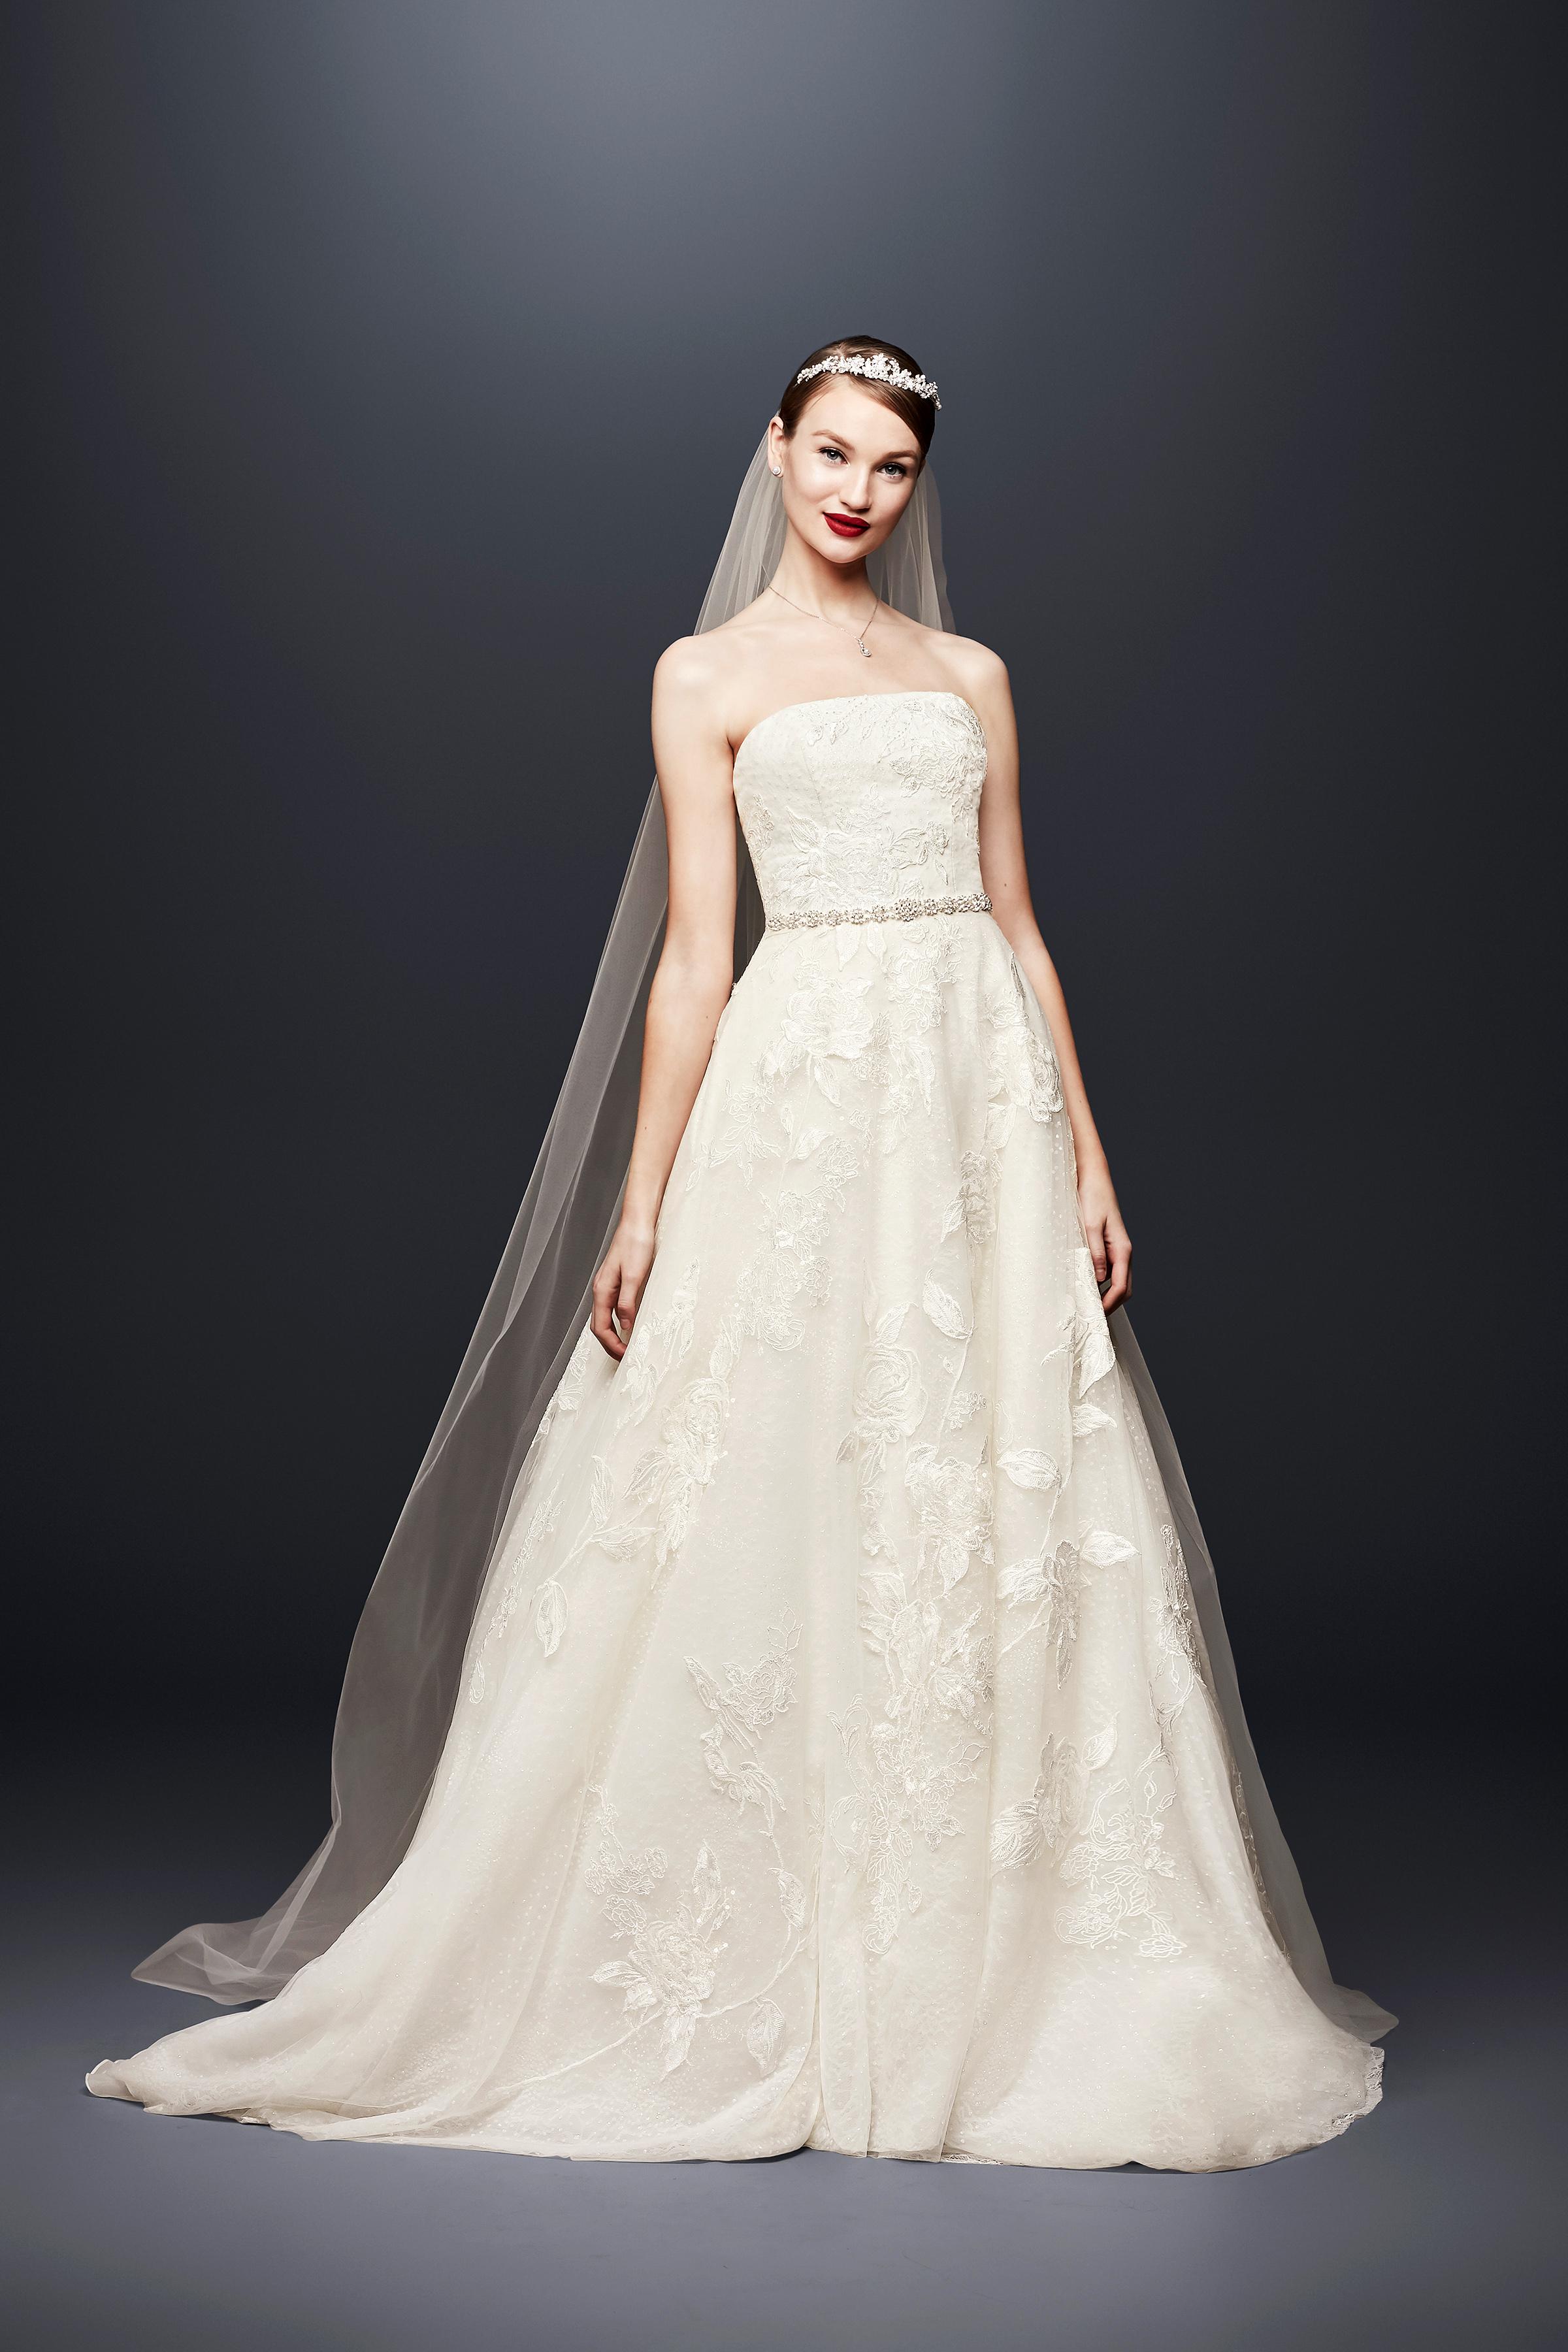 david bridal wedding dress spring 2019 a-line strapless beaded belt